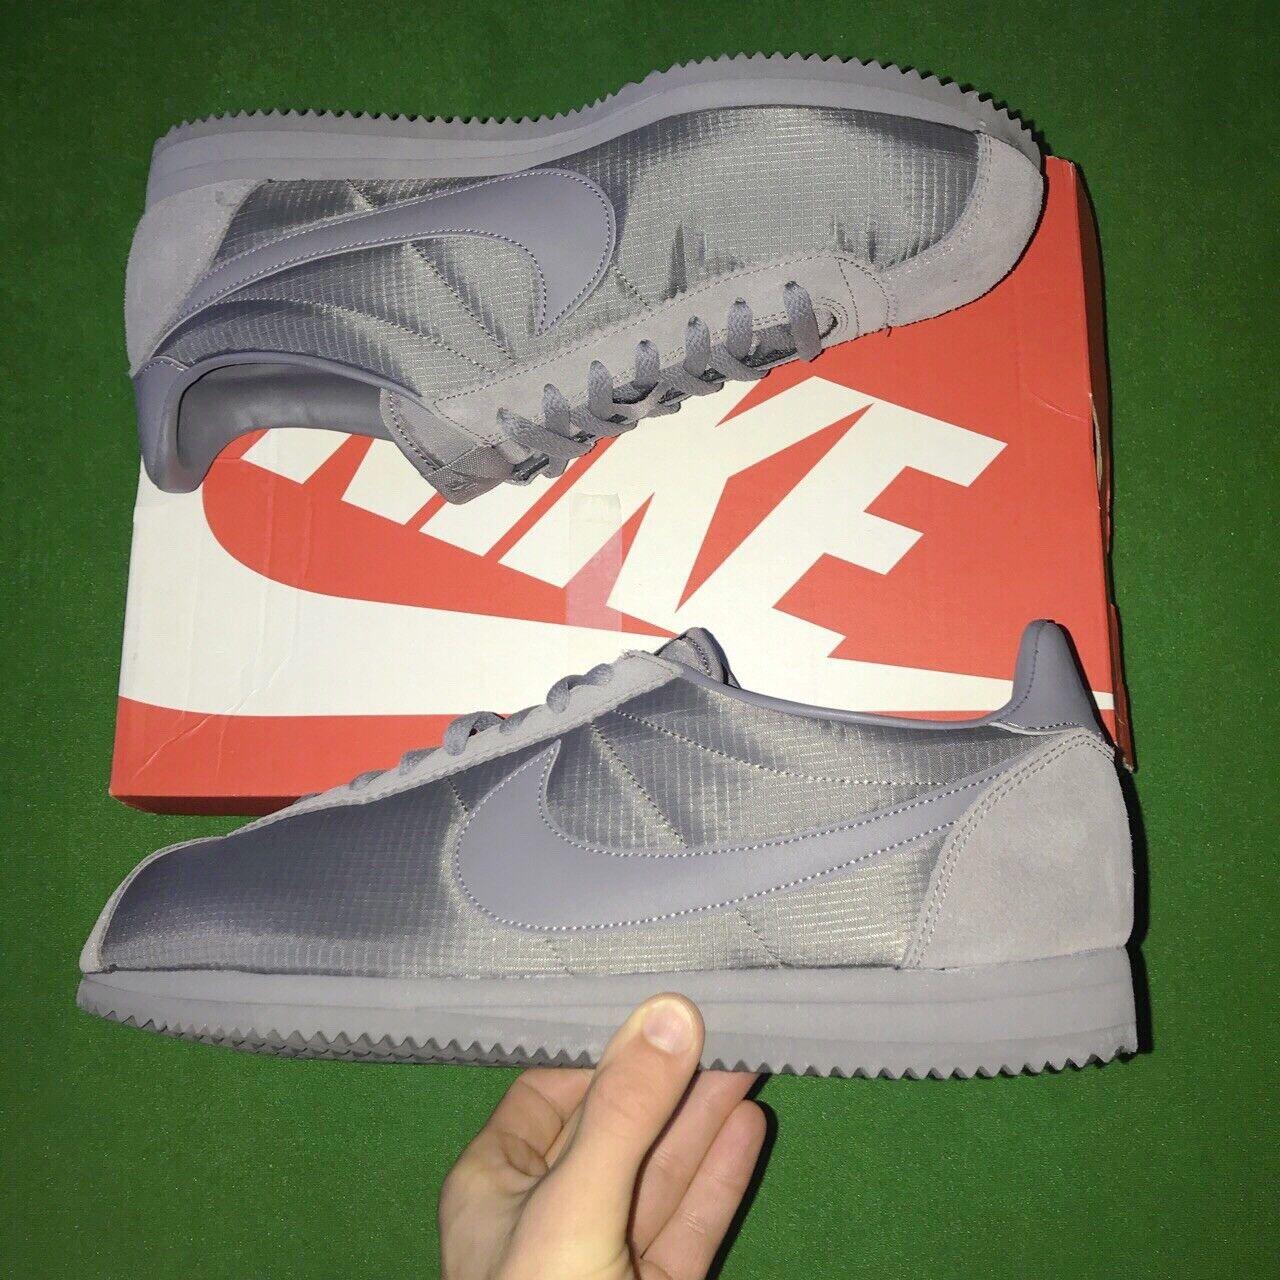 Cortez Taille Neuf Classic Gunsmoke Nike Gris Boite Avec n08PkXZNwO